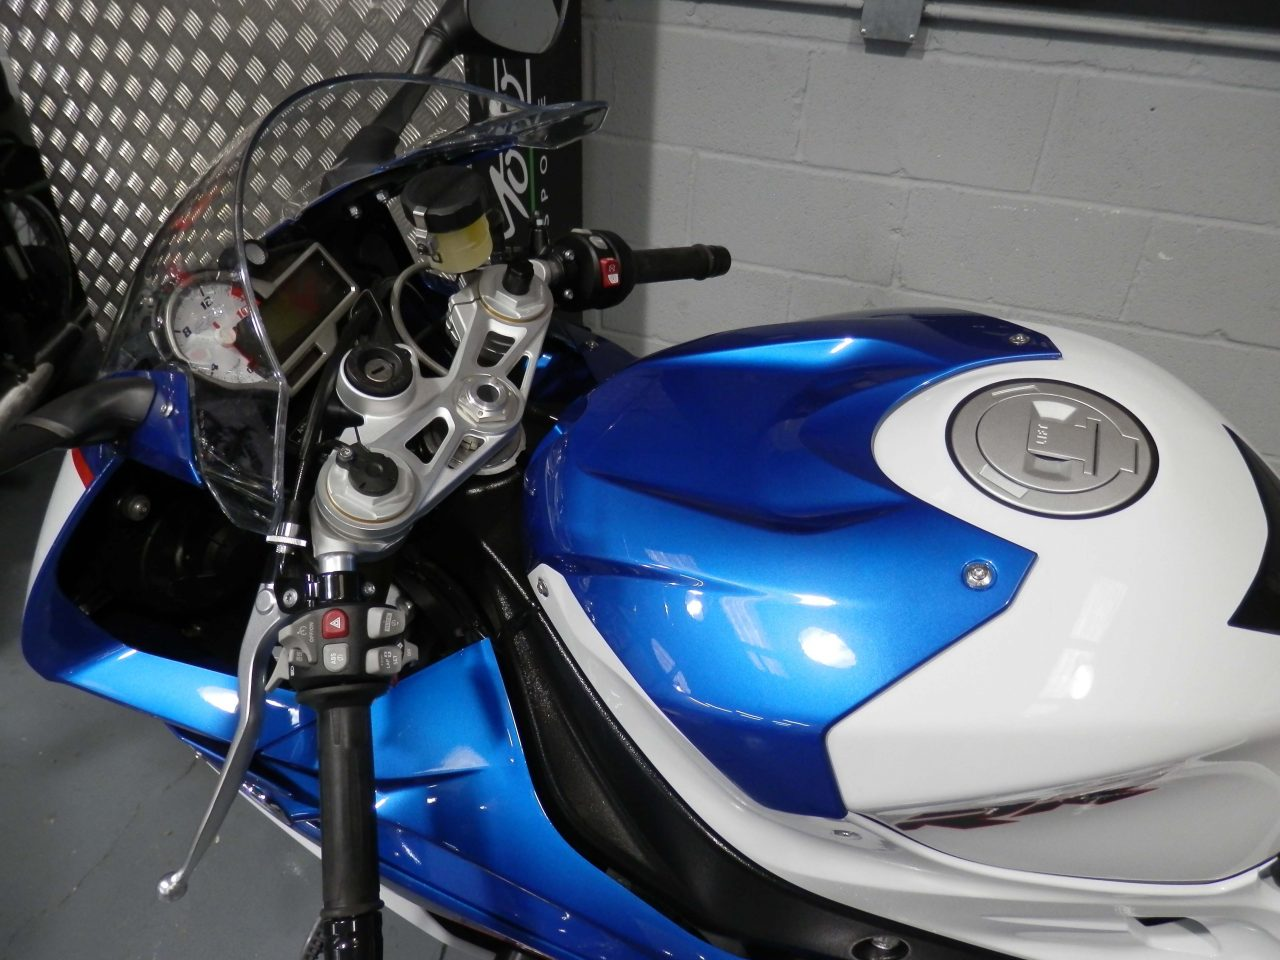 BMW S 1000 RR super sport